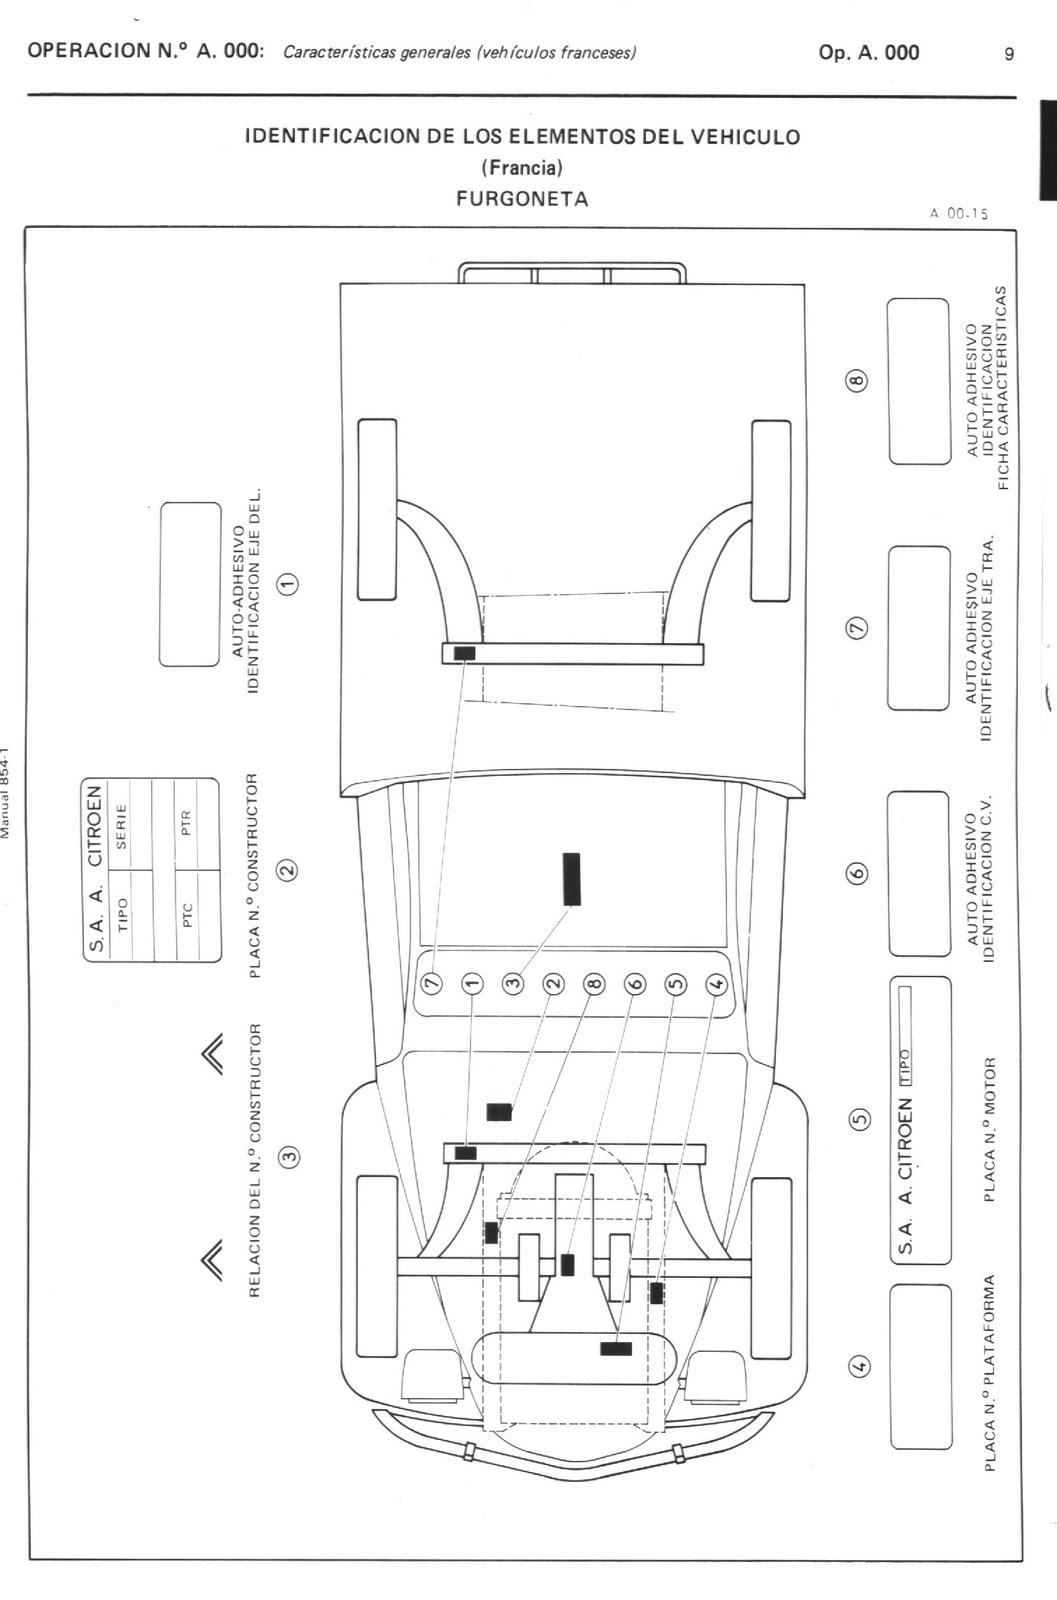 lalo-manuales de mecanica: manual de mecanica de citroen